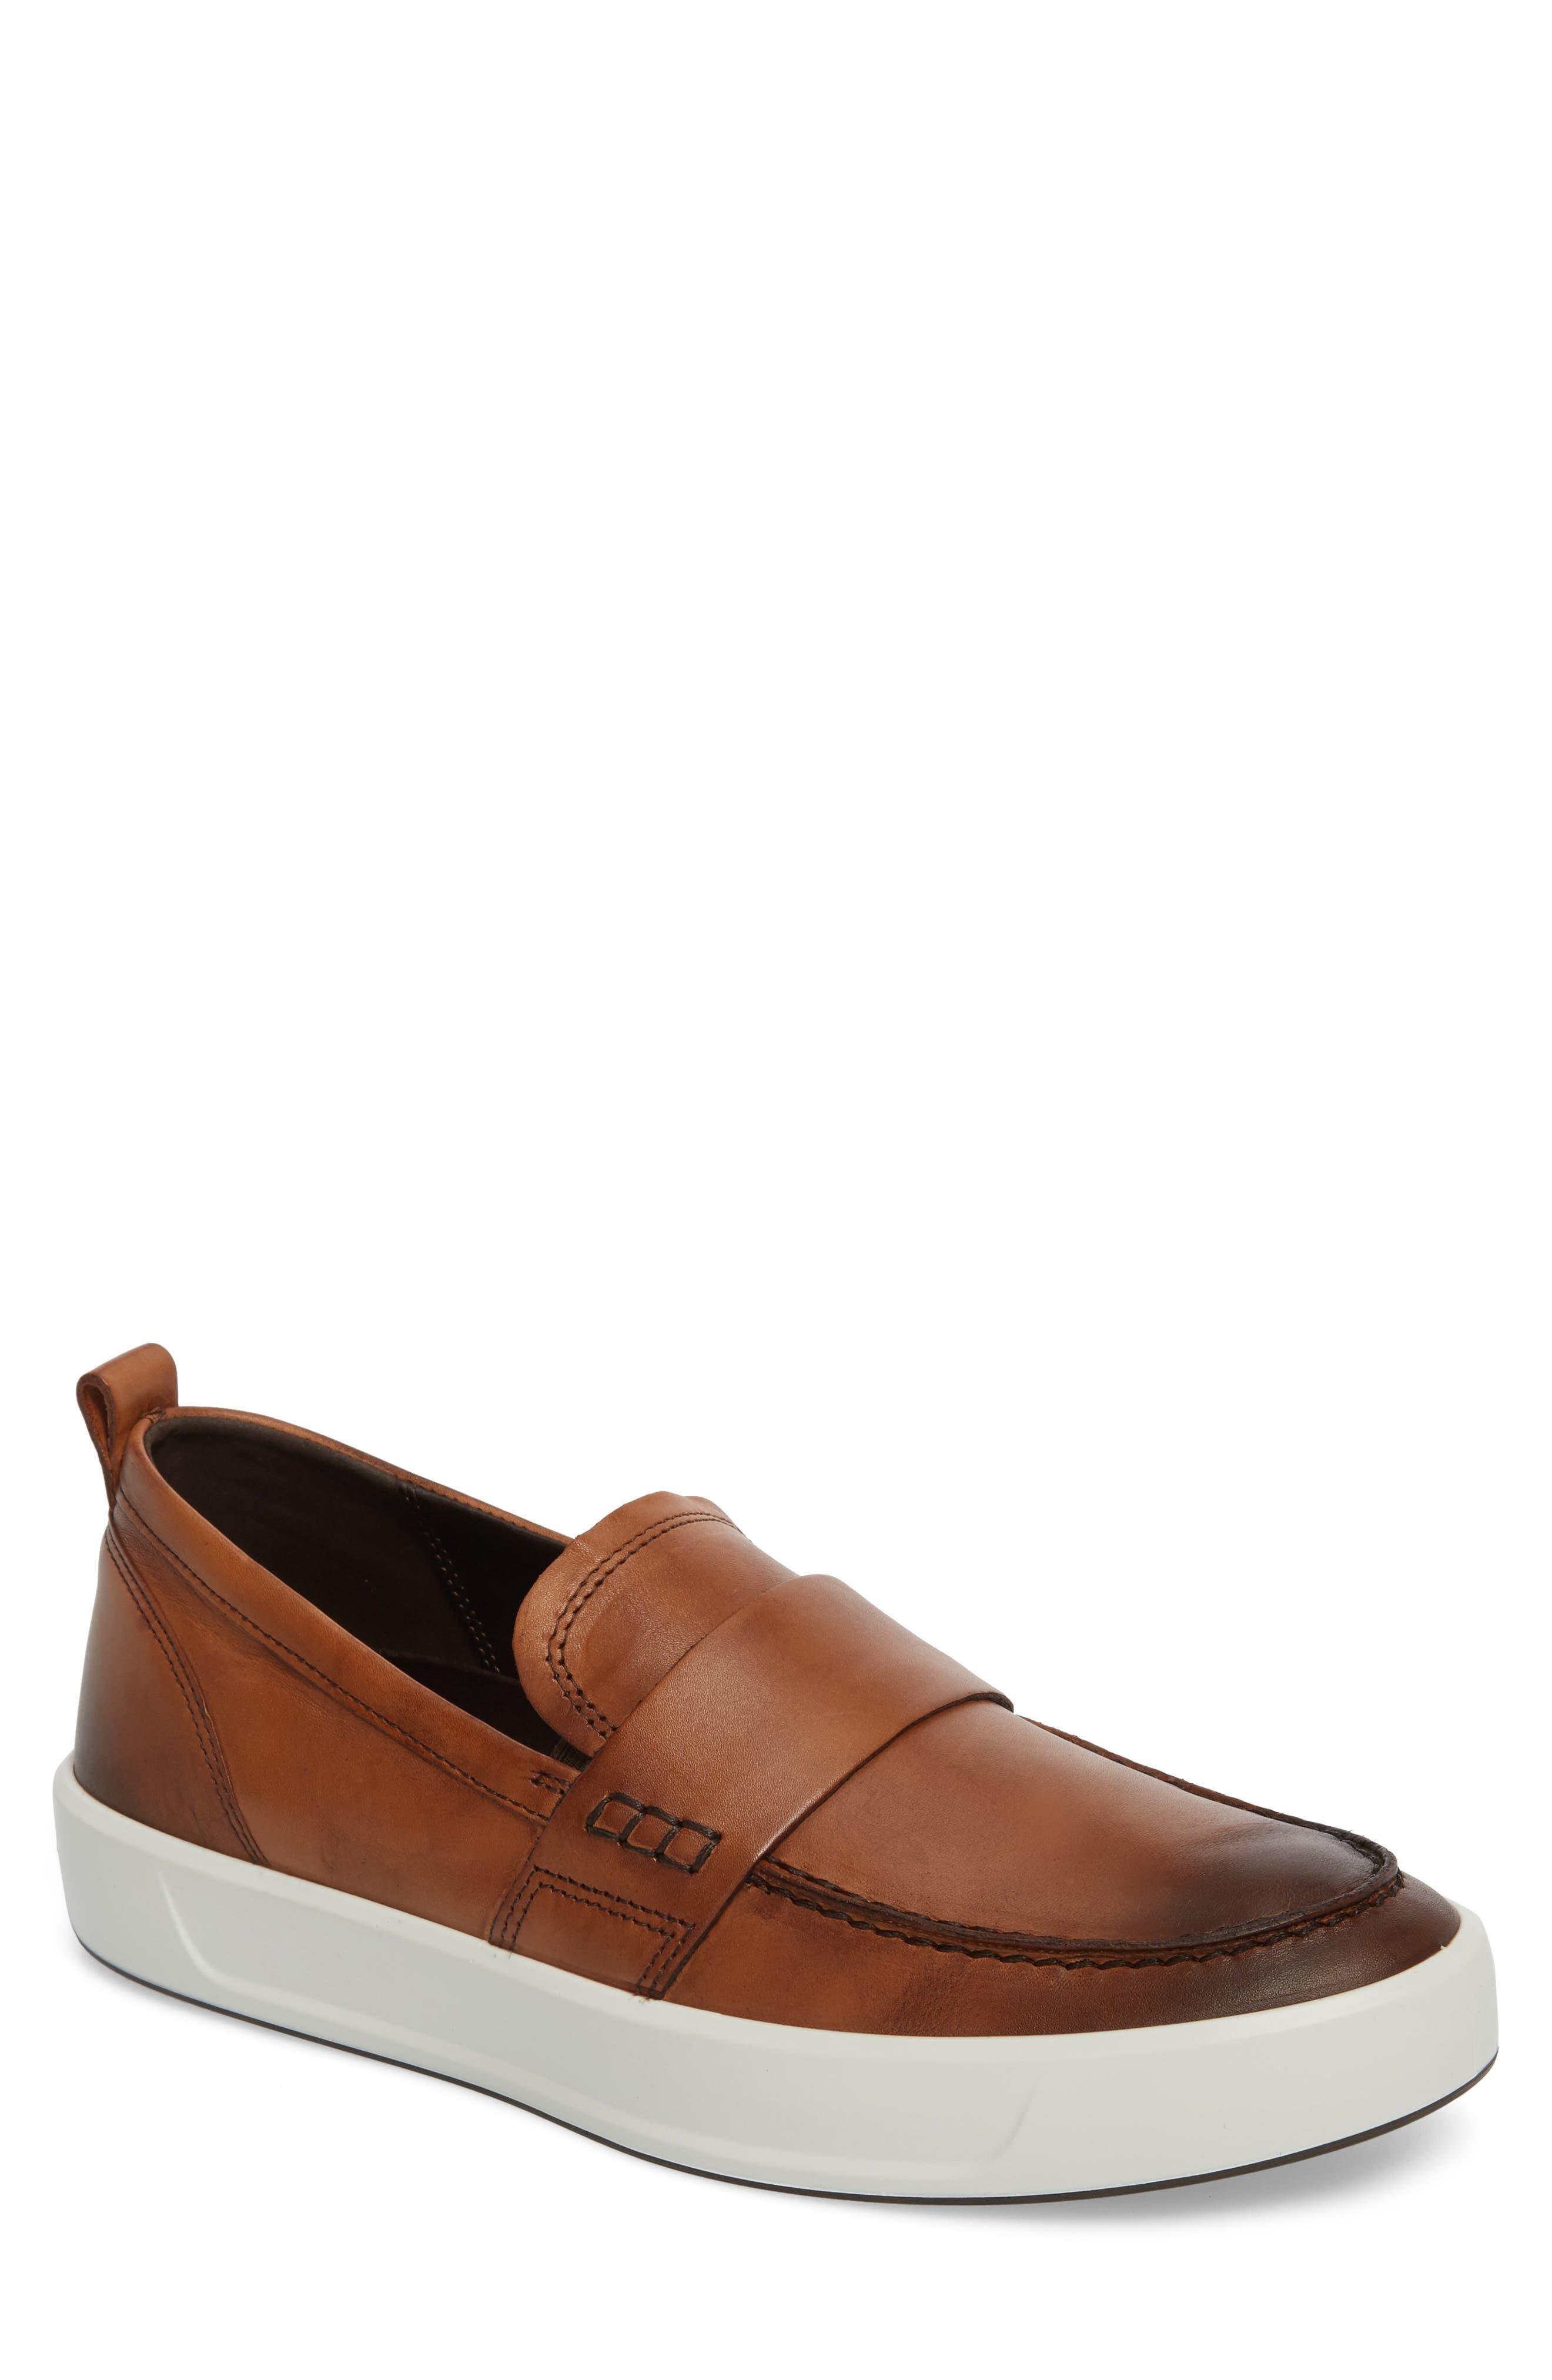 Soft 8 Slip-On,                         Main,                         color, Lion Leather